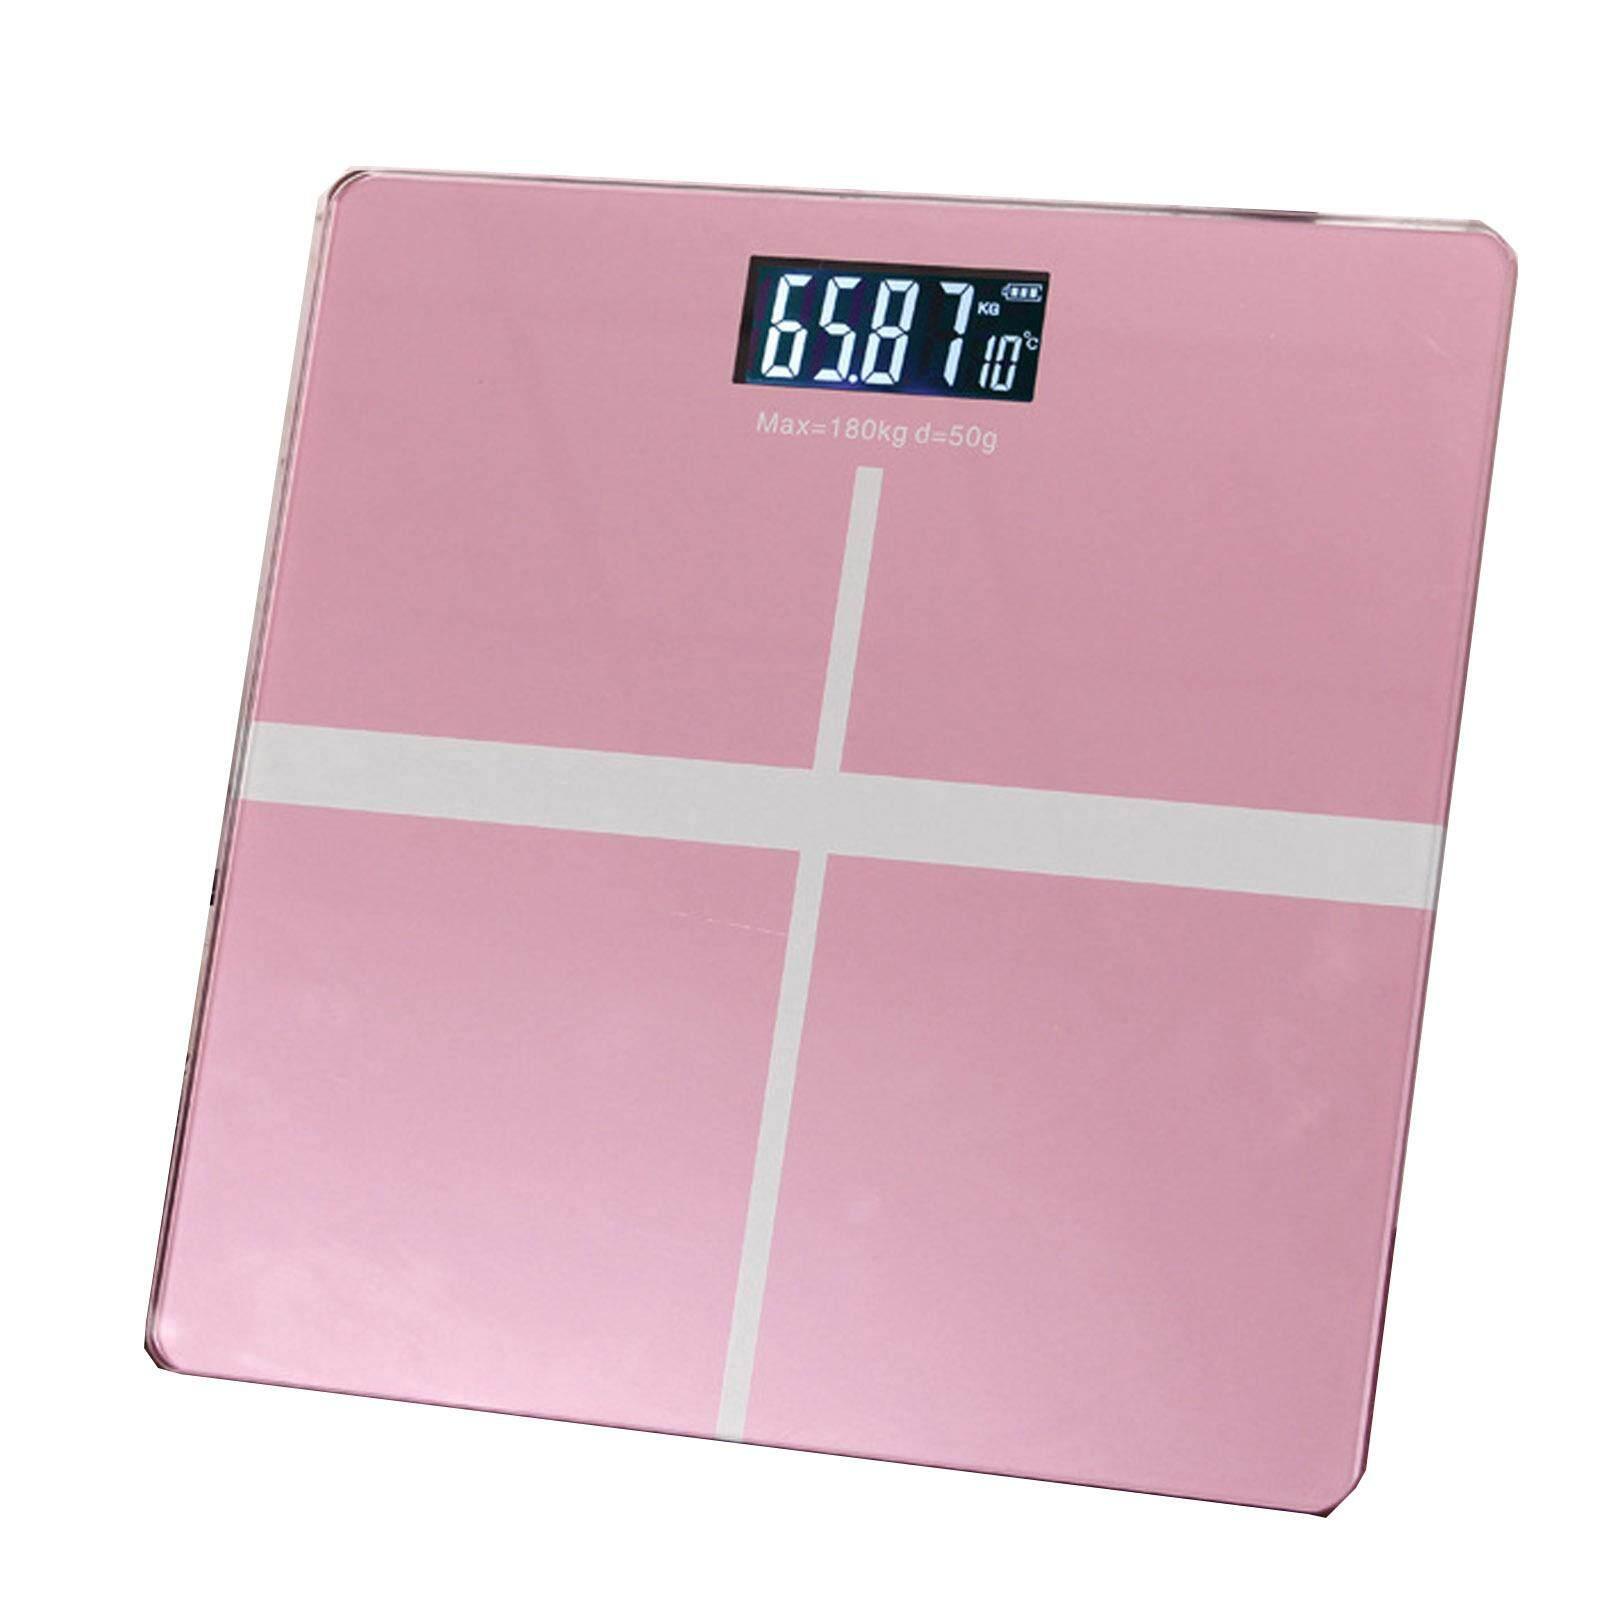 Nava Precision 28cm Digital Weighing Machine Body Measuring Scale Rose Pink